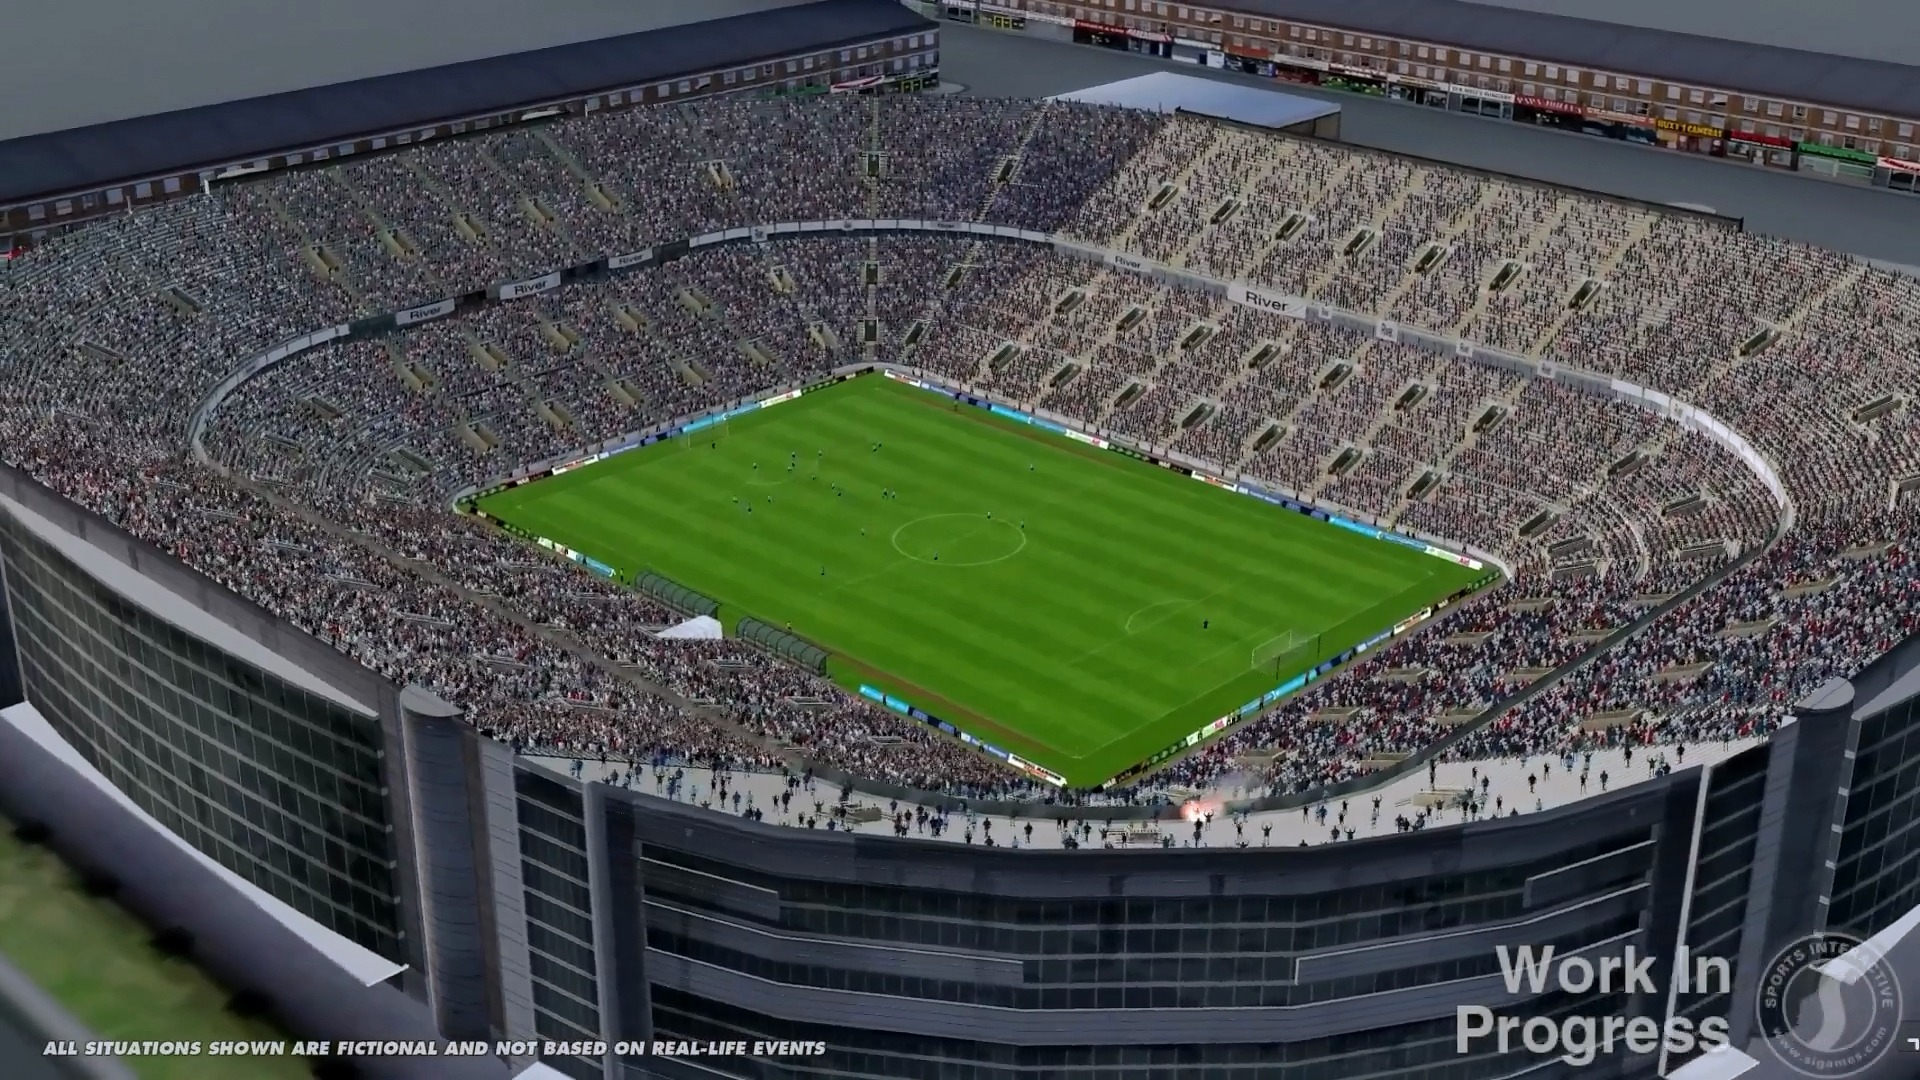 Football_Manager_2015_Match_Engine_Stadium_2